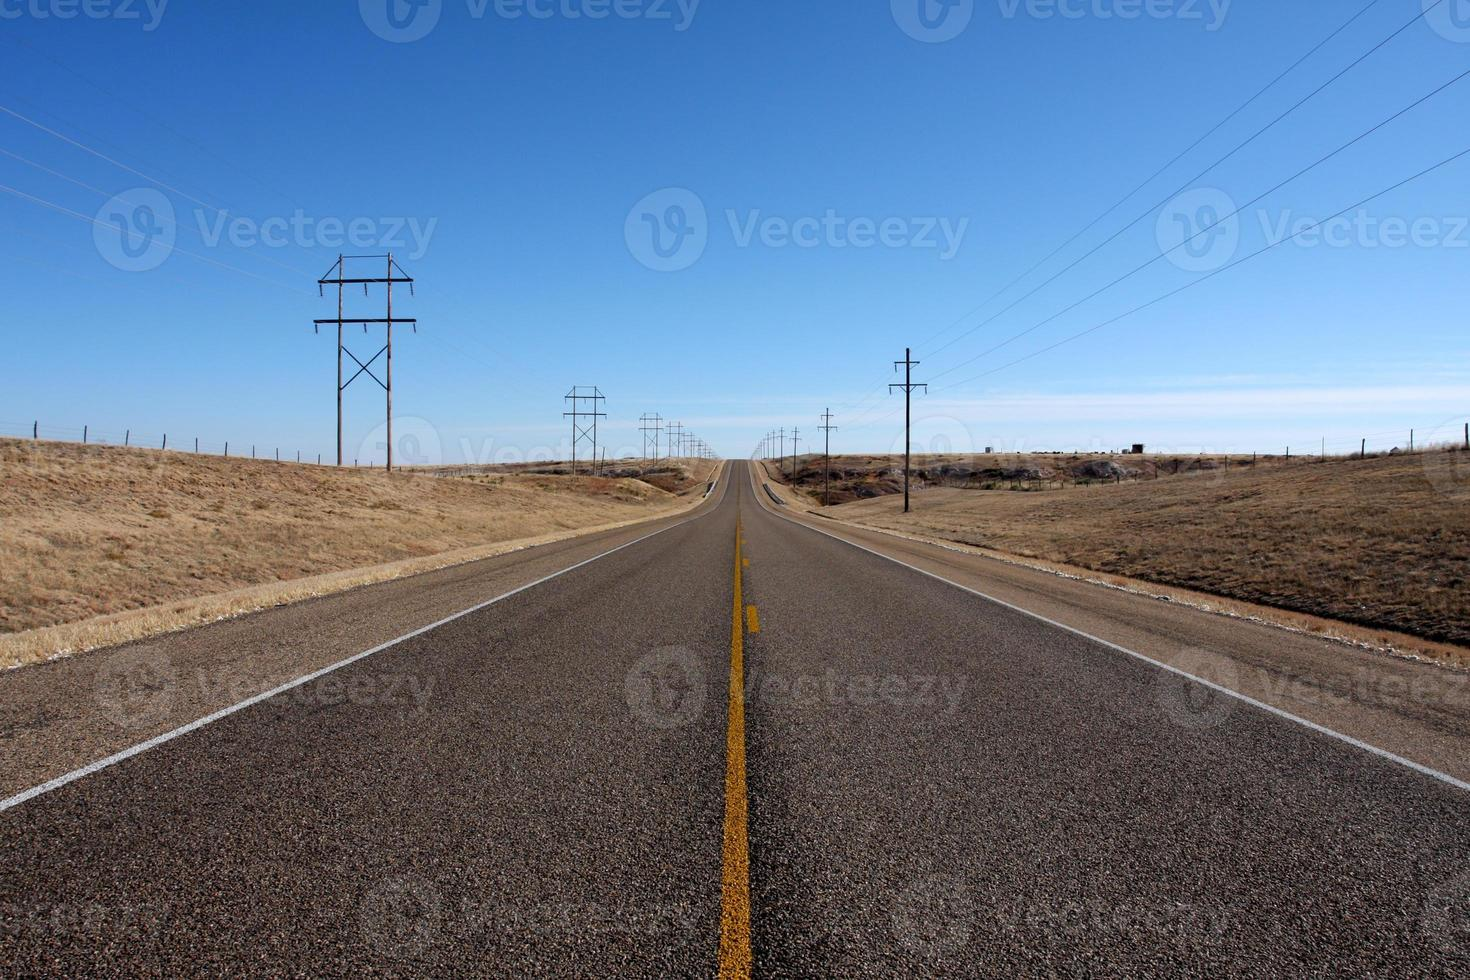 autostrada del paese di Panhandle foto